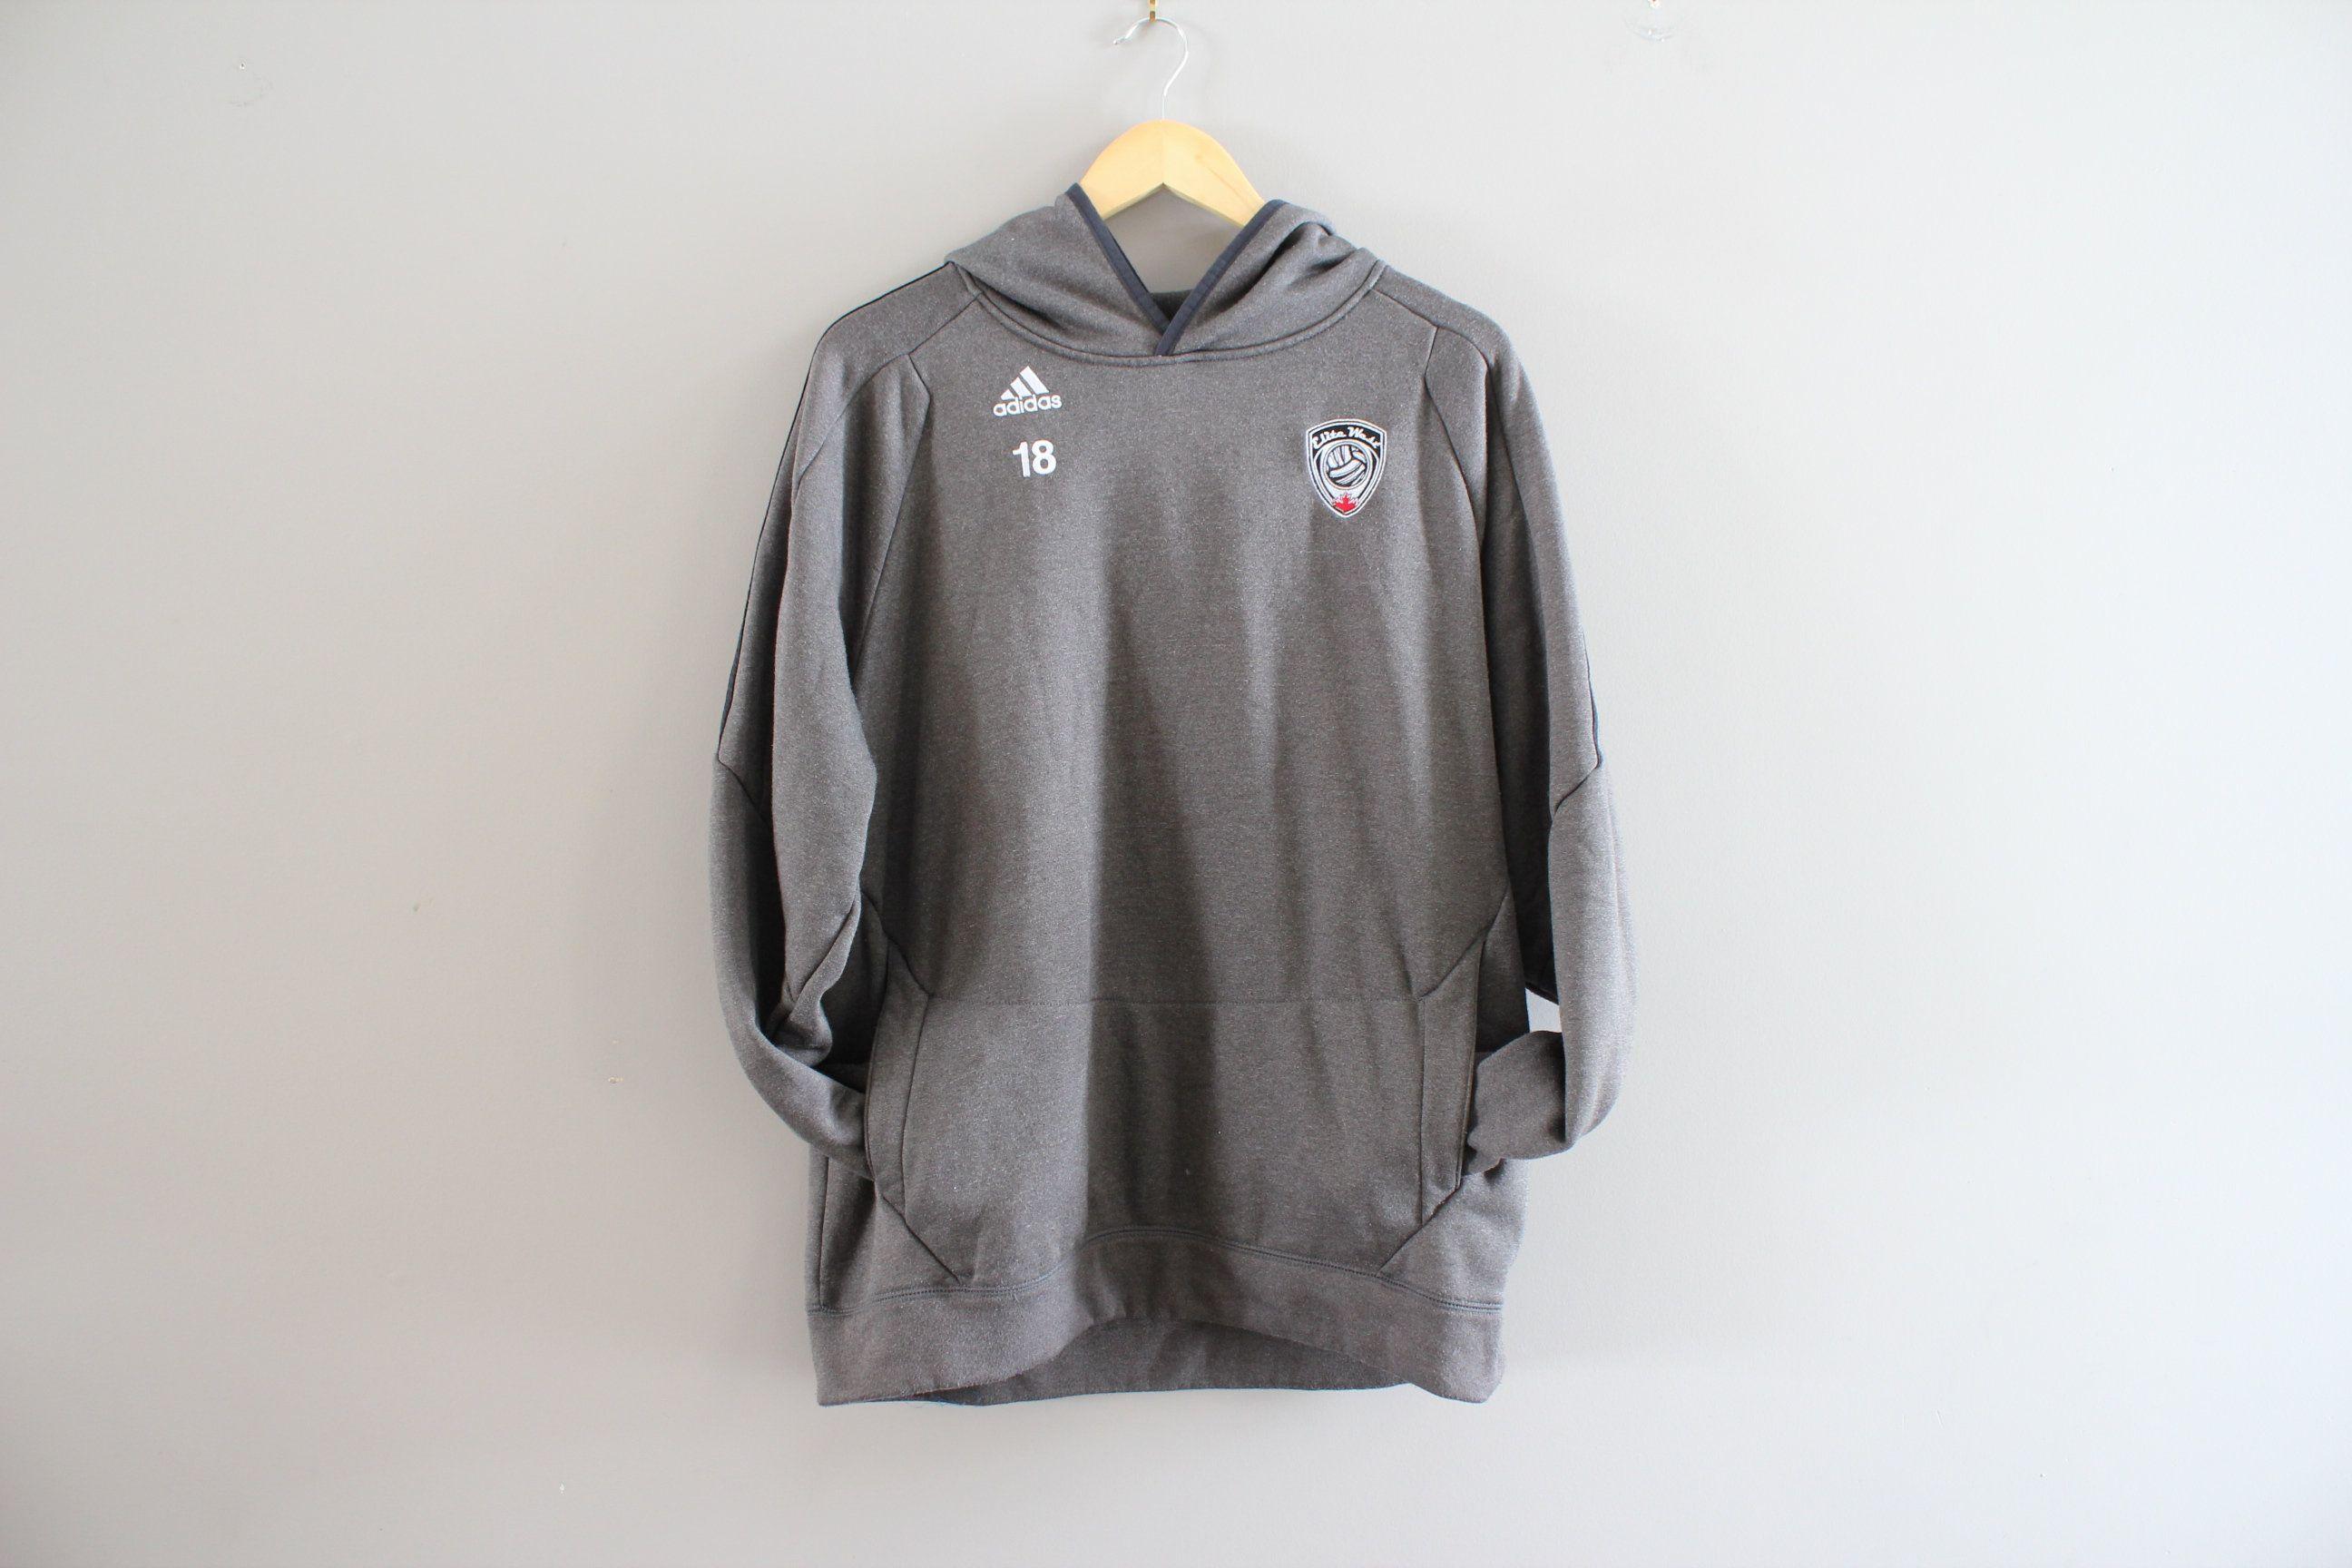 Adidas Sweatshirt Dark Grey Fleece Lining Cotton Adidas Hoodie Etsy Adidas Sweatshirt Adidas Hoodie Adidas Pullover [ 1728 x 2592 Pixel ]